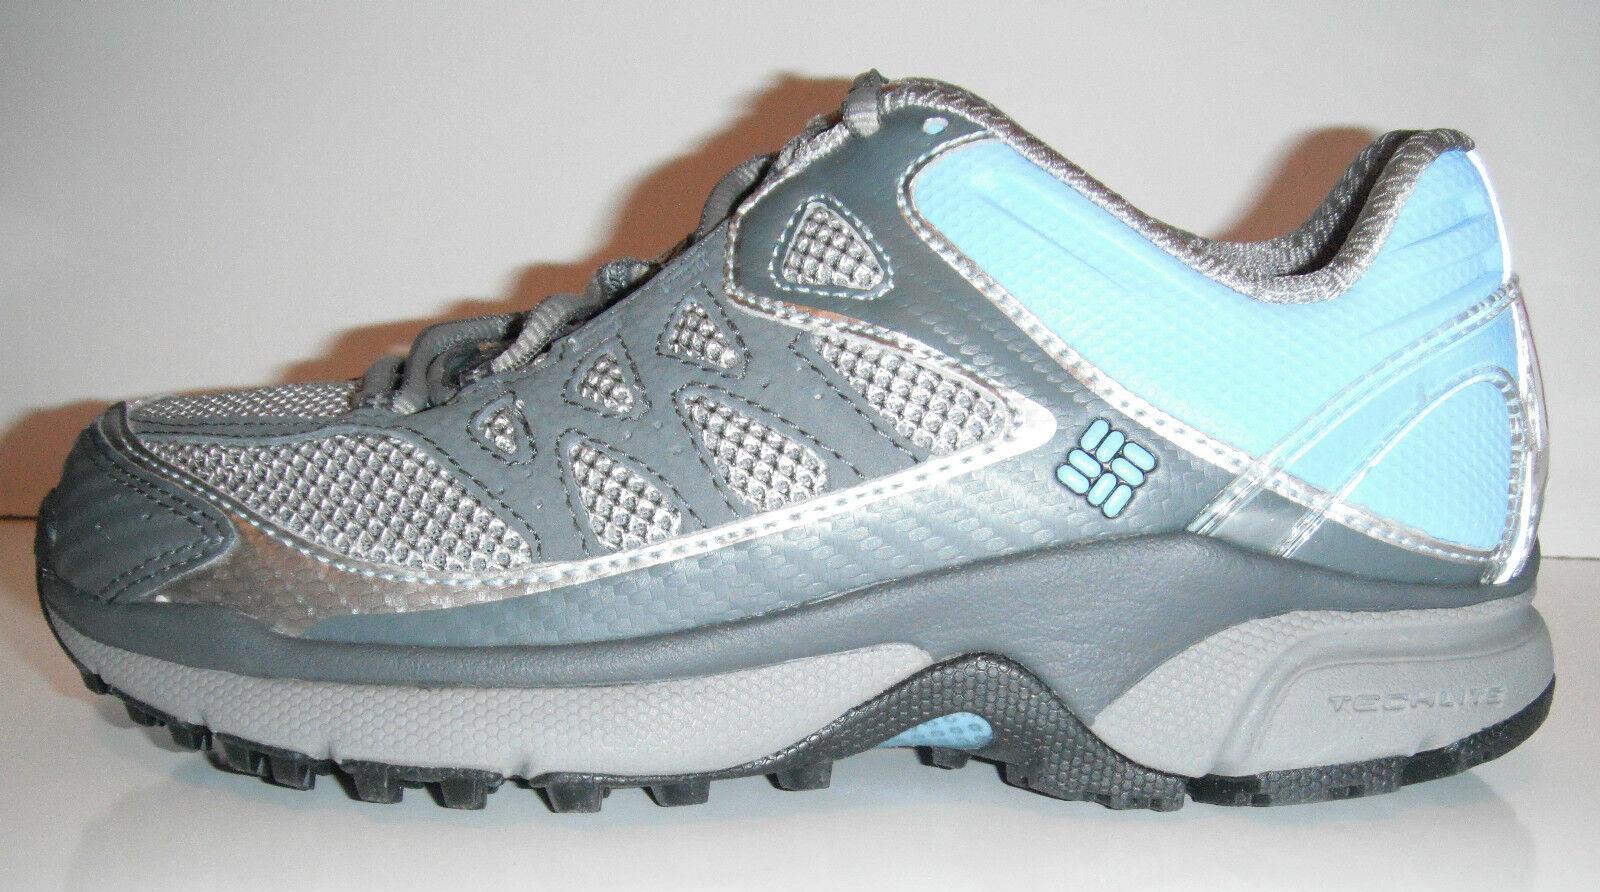 Nuevo Columbia Bl 3659 de la mujer Ravenous estabilidad Running Trail Running estabilidad zapatos Talla 8  110 be3dfc